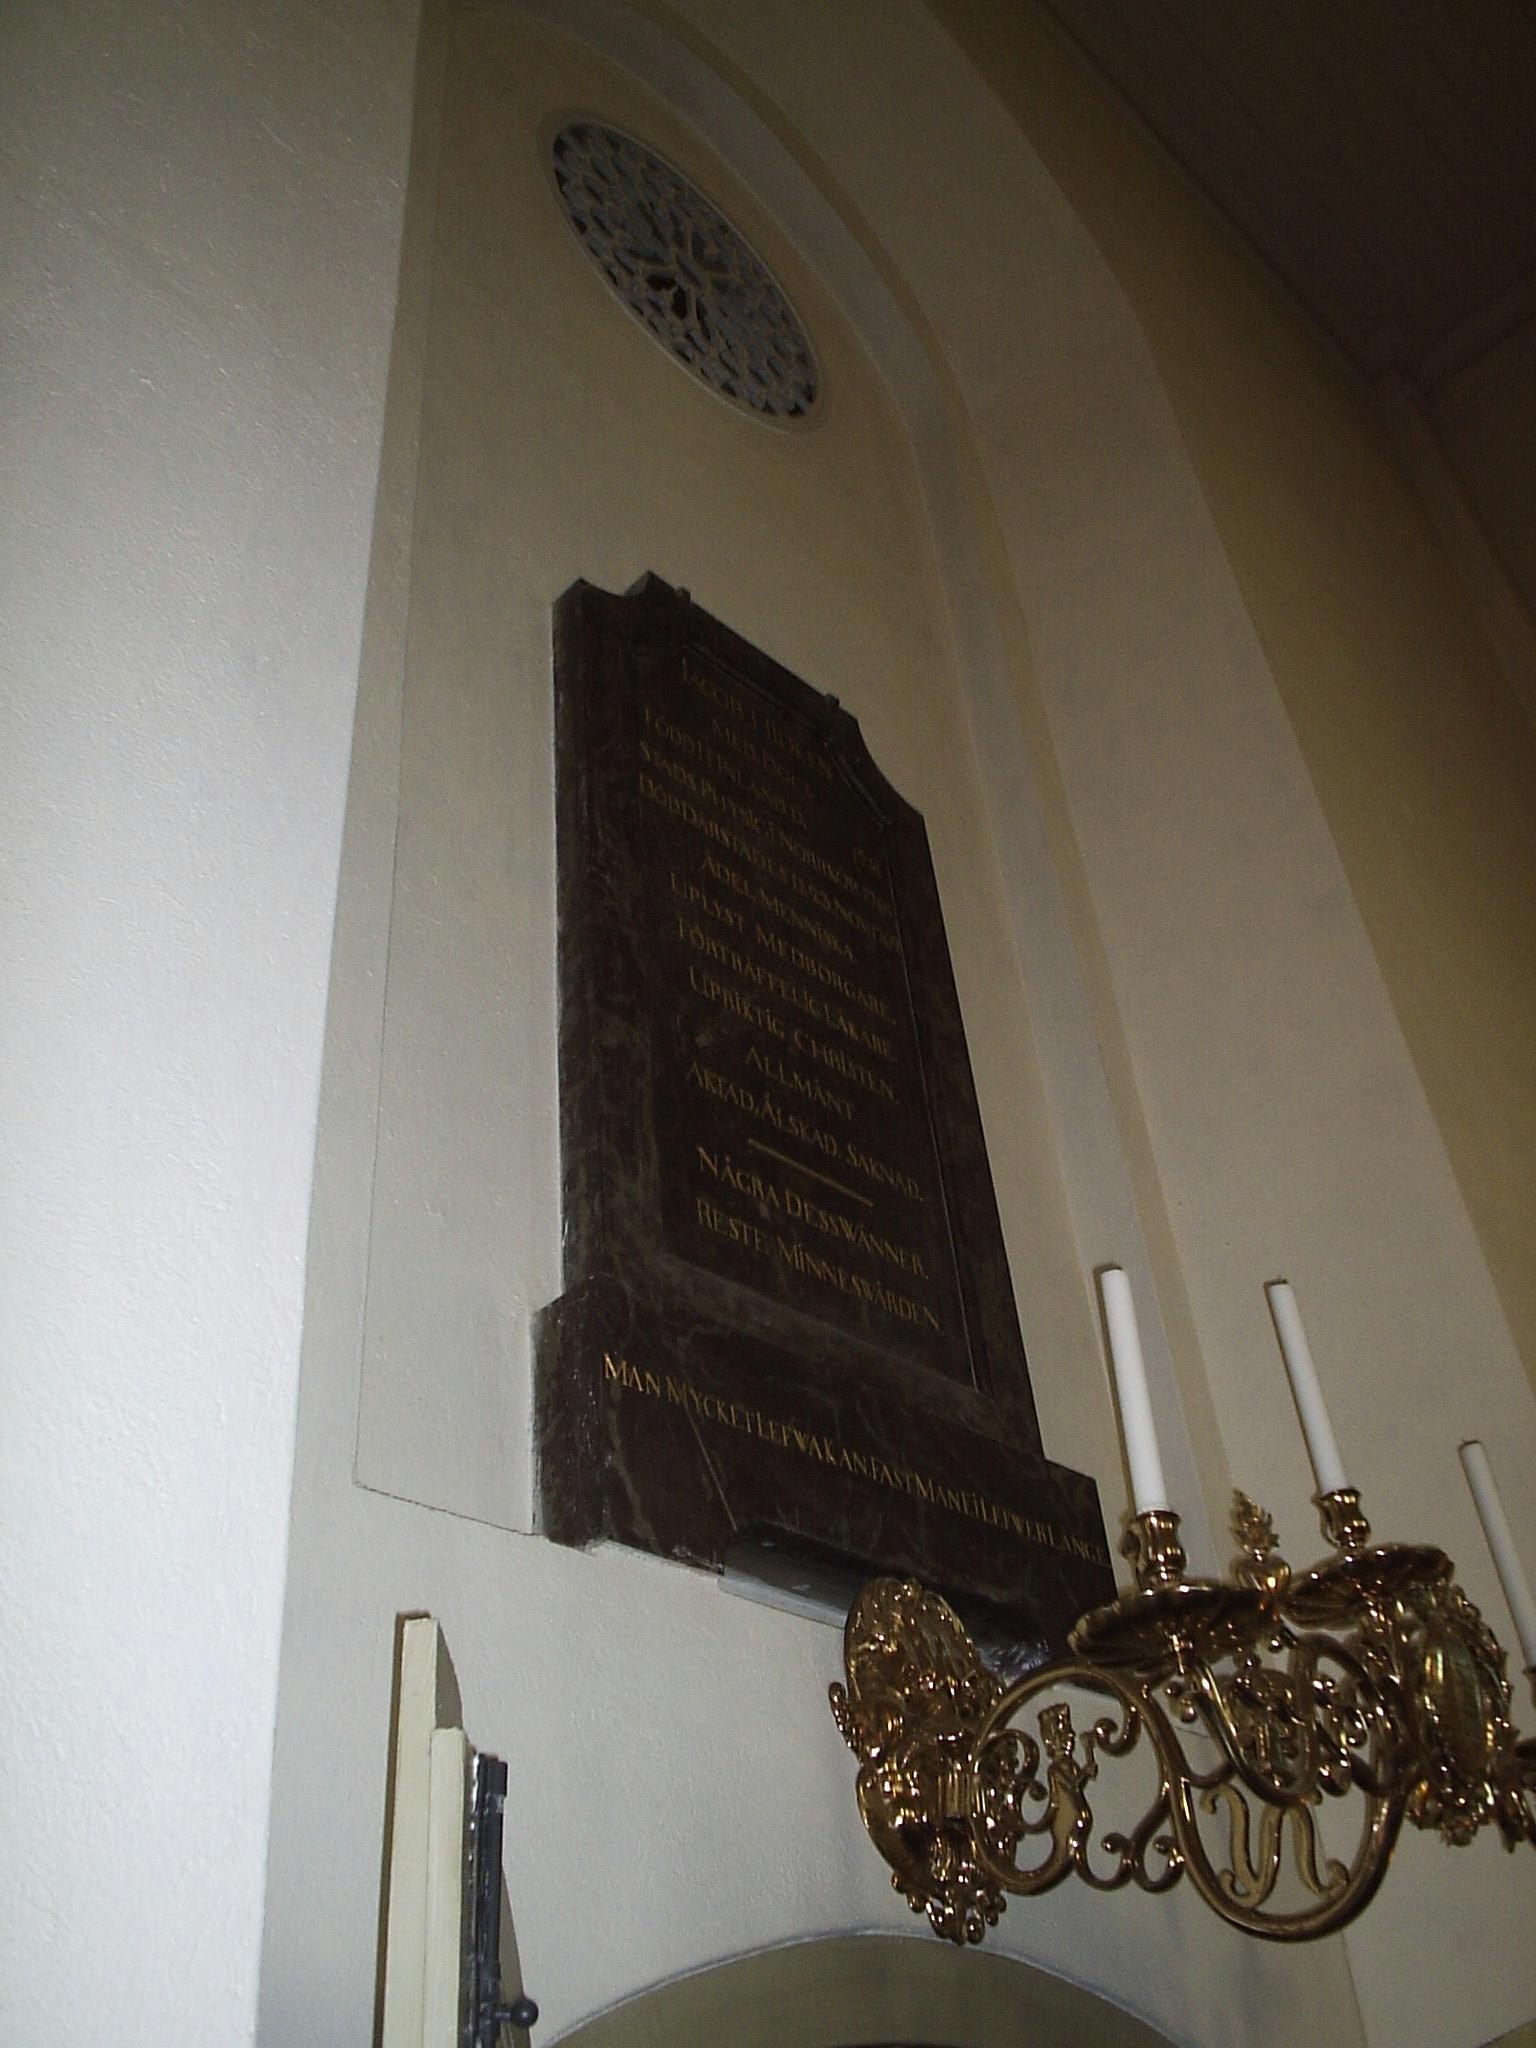 Fil:Sankt Olai kyrka i Norrkping, den 21 - Wikipedia